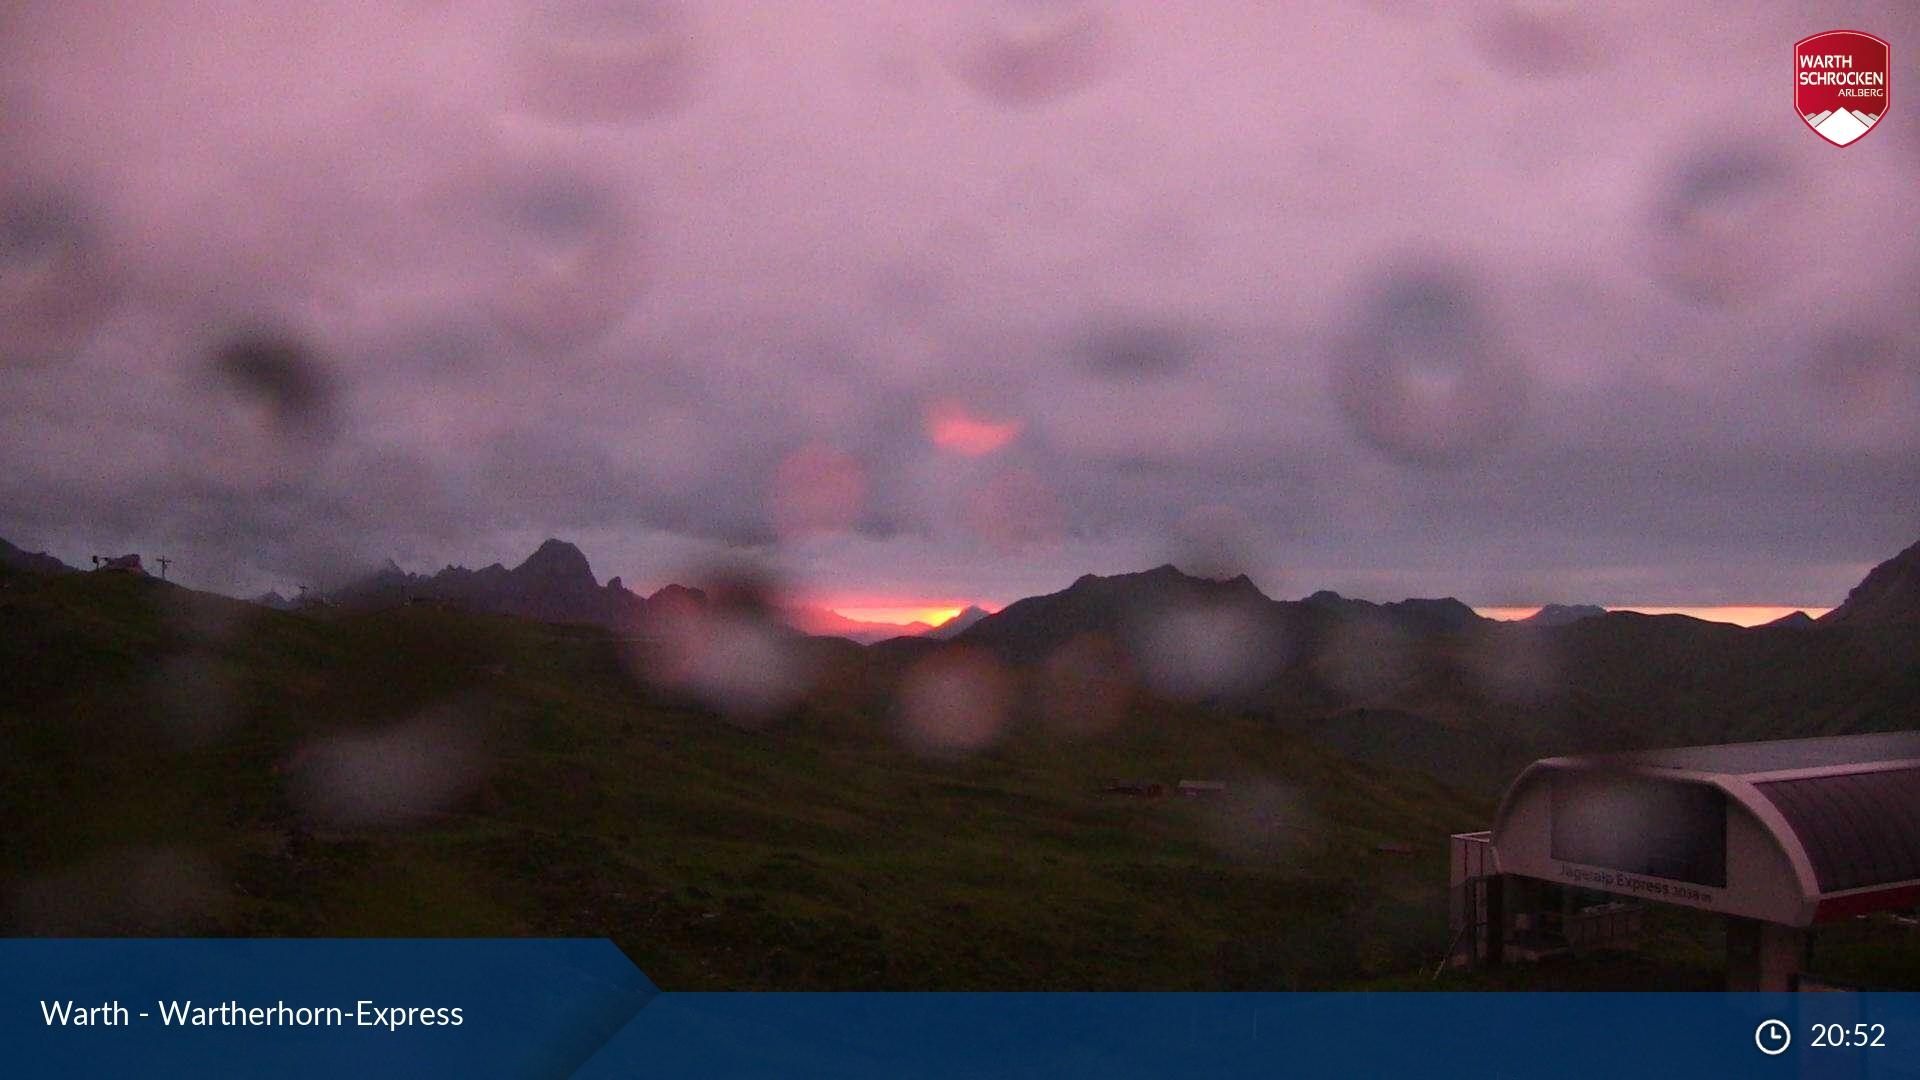 Ski Arlberg - Warth webcam - Wartherhorn Express